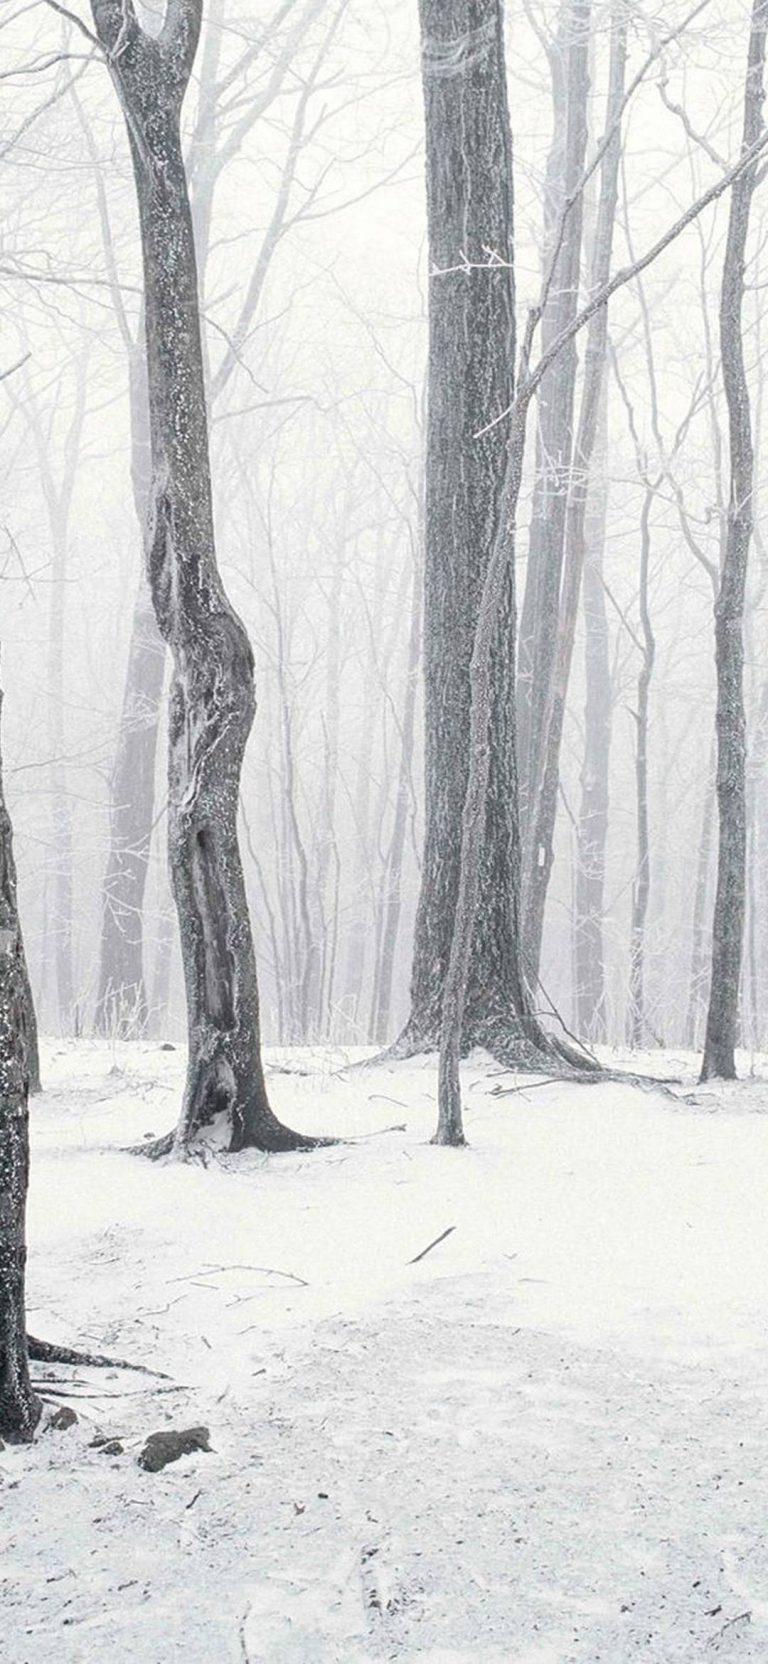 Trees Winter Snow 1080x2340 768x1664